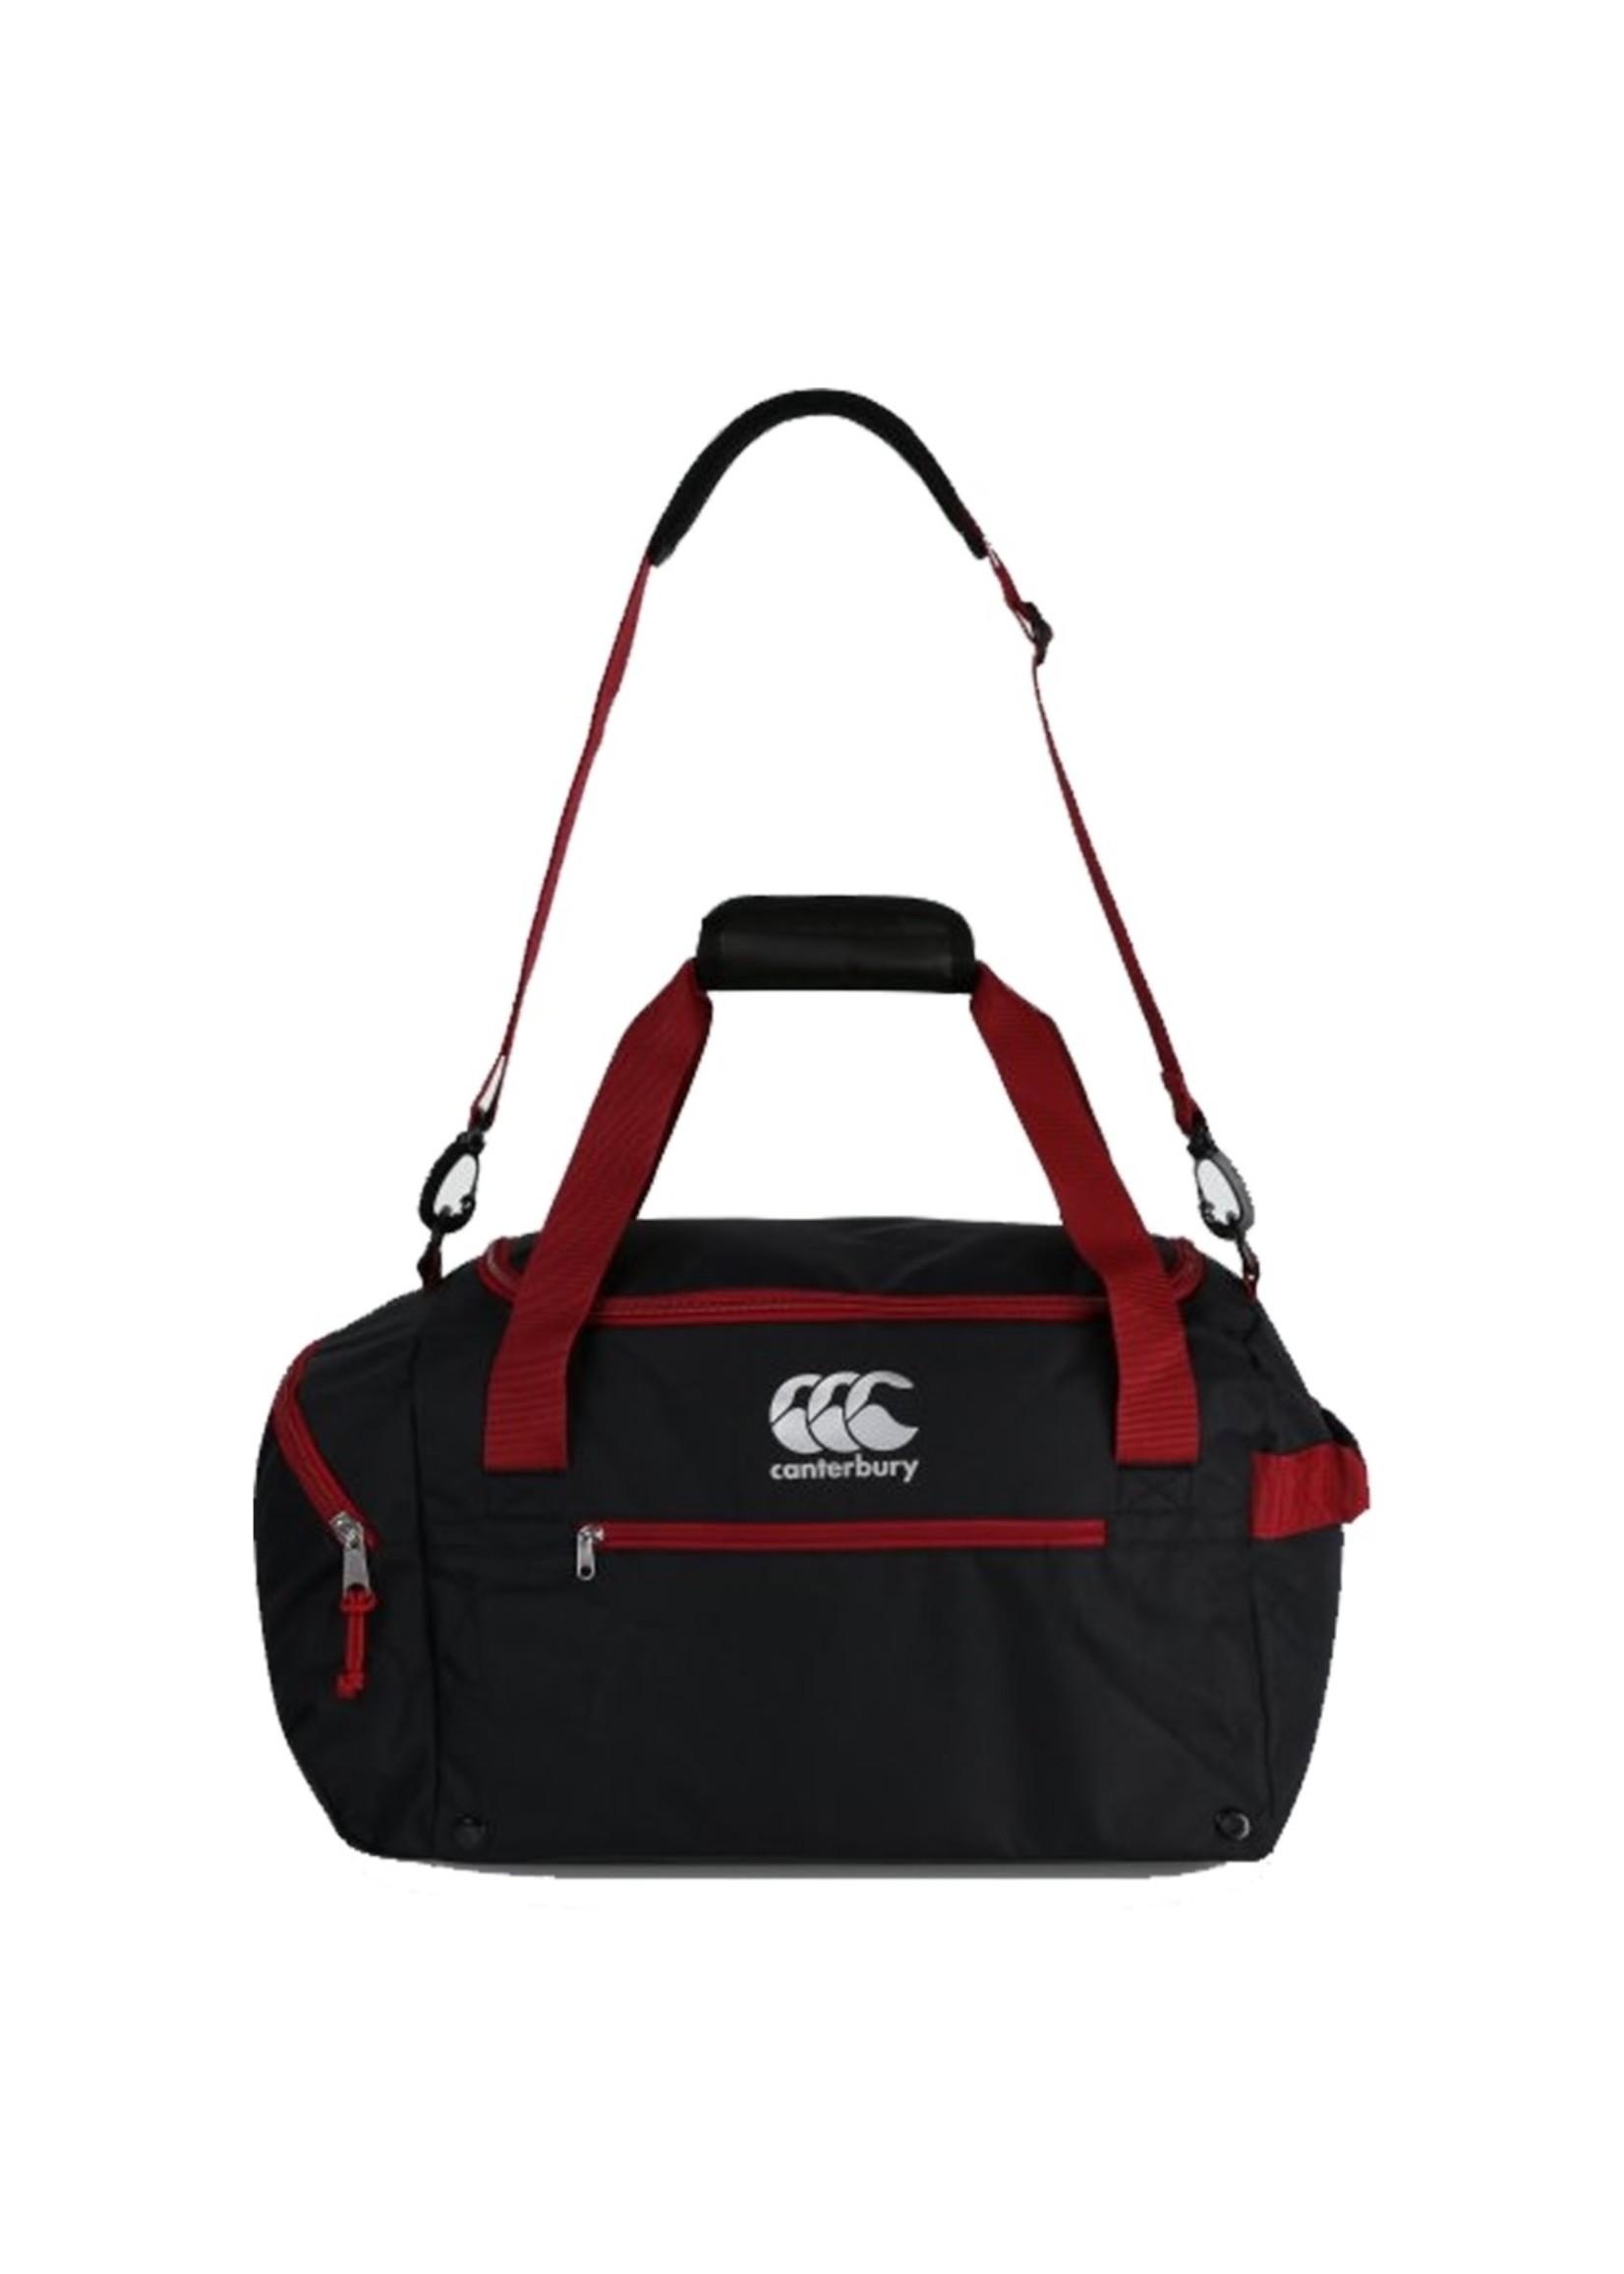 Canterbury Canterbury Small Sports Bag (2020)